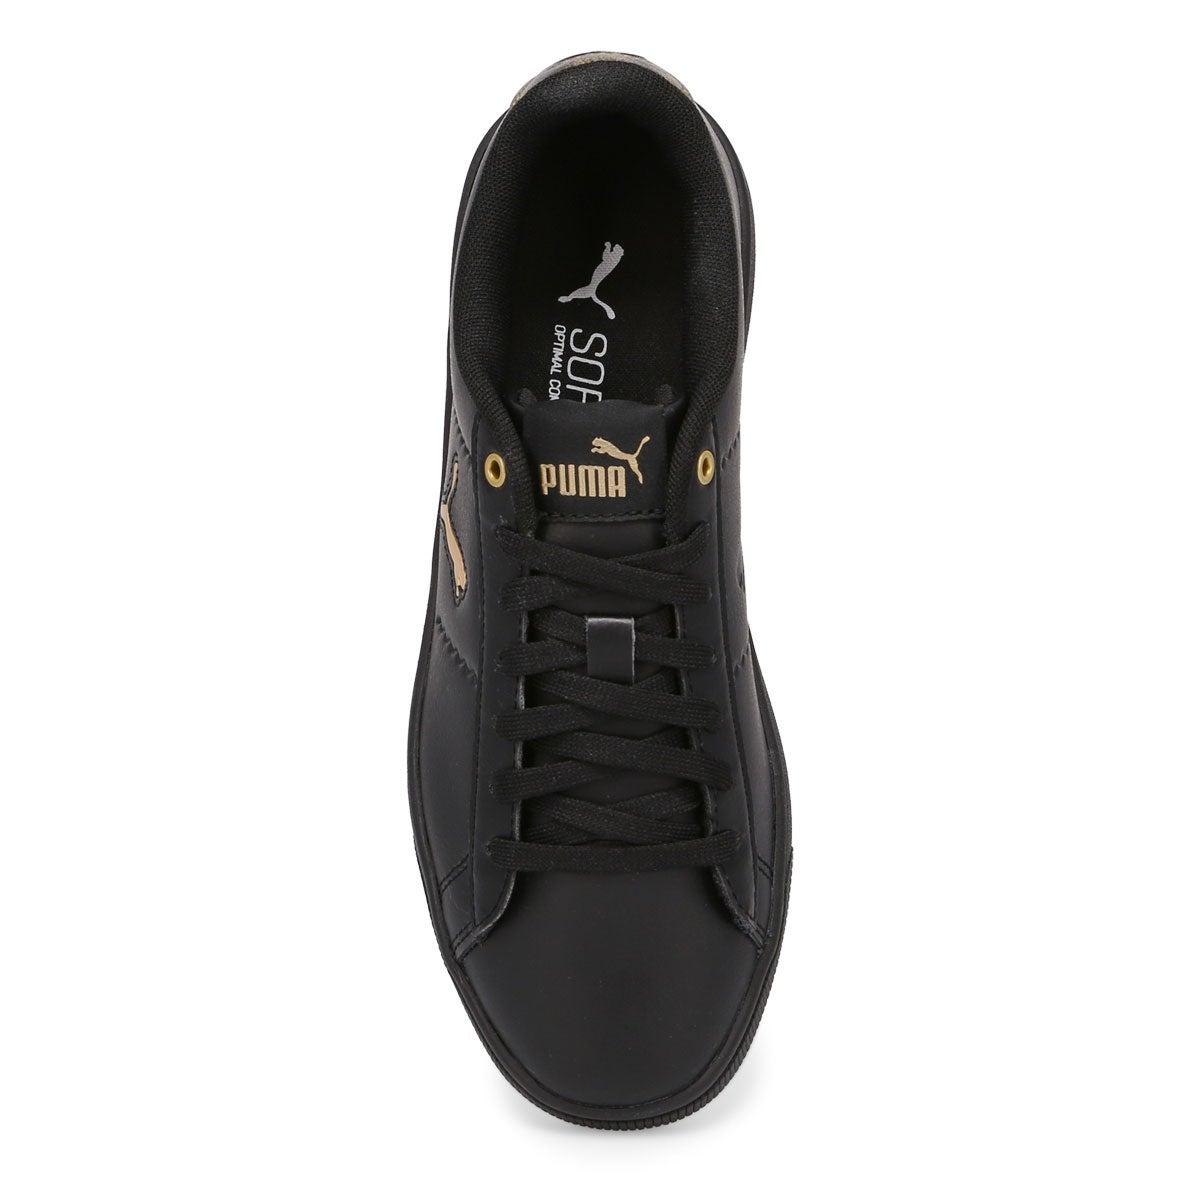 Women's Puma Vikky V2 Cat Sneaker- metallic bk/gd